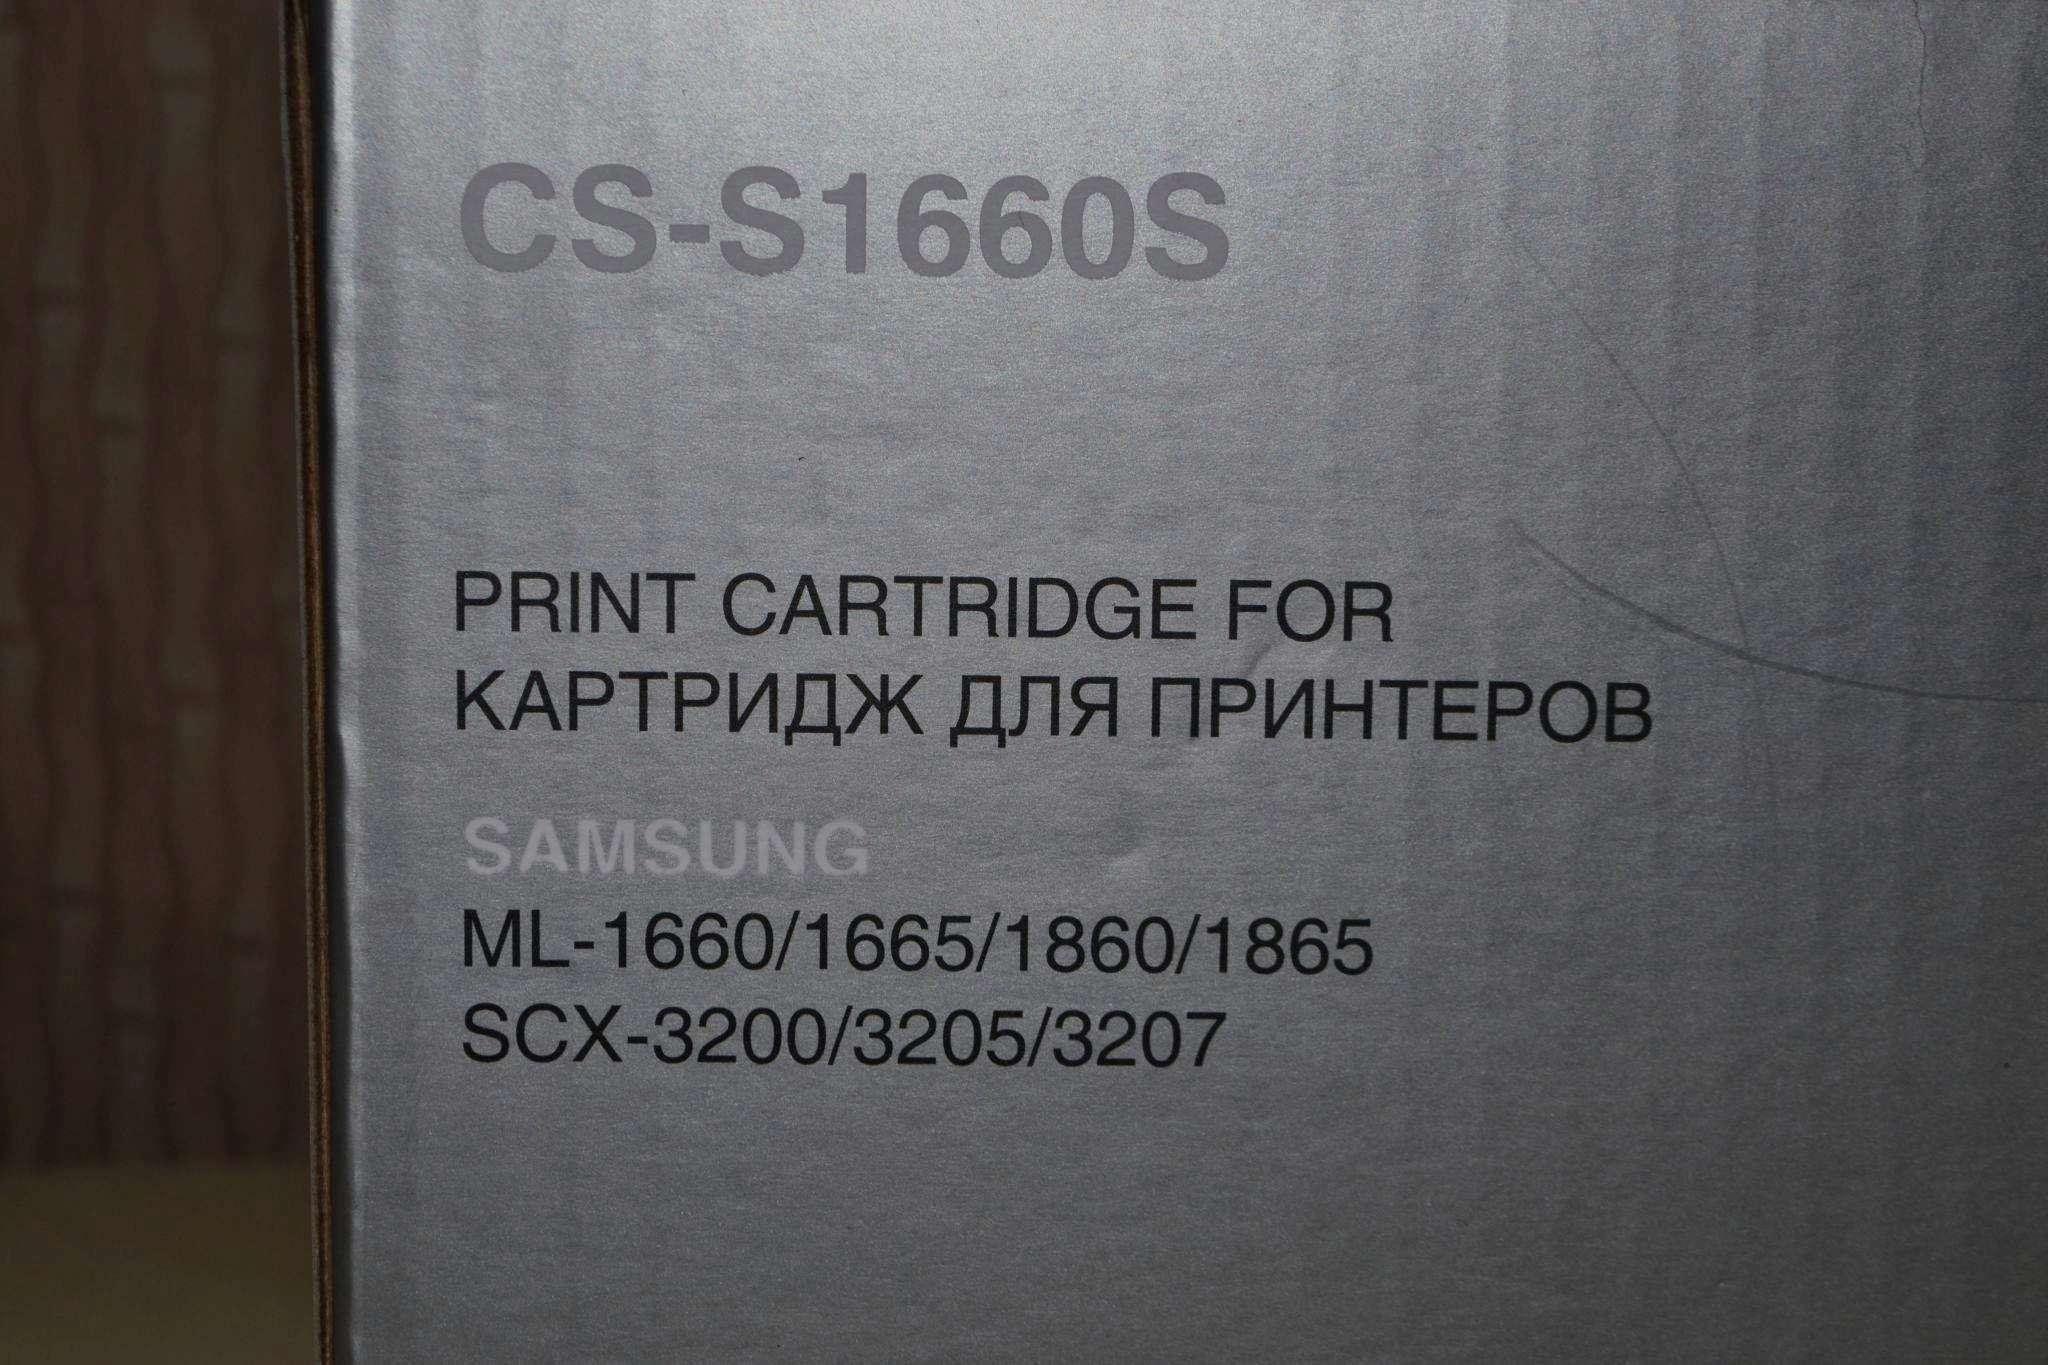 samsung scx-3205 инструкция